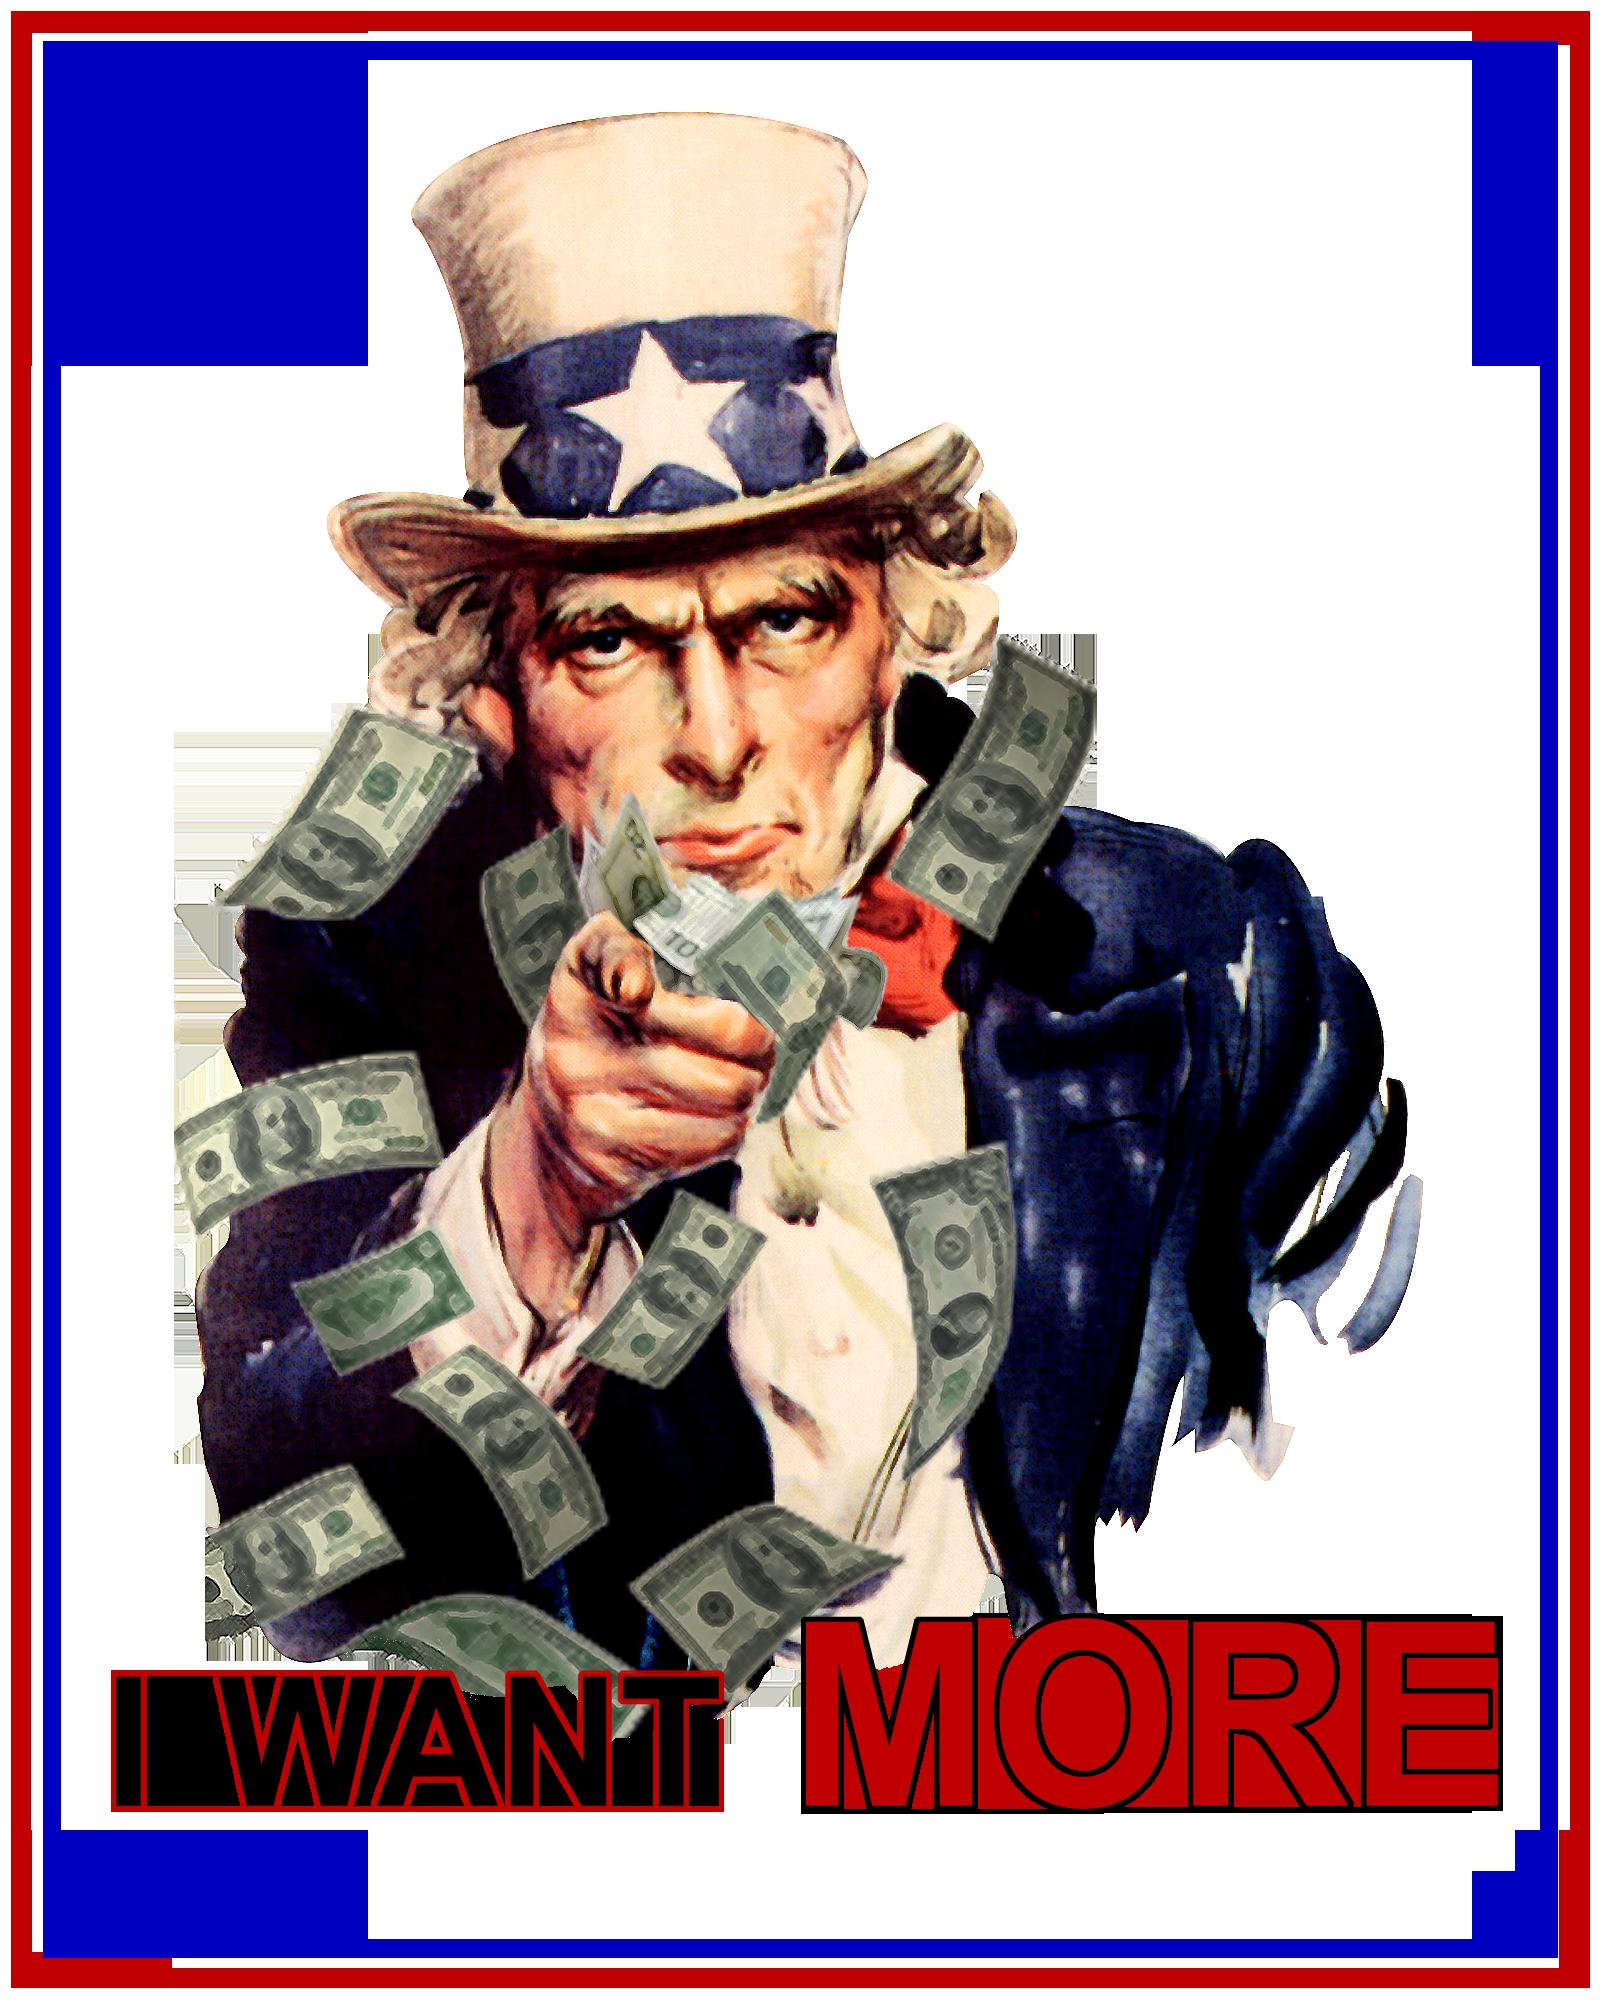 Uncle Sam Making It Rain Money Demands I Want More Uncle Sam Ponzi Scheme Because The Internet